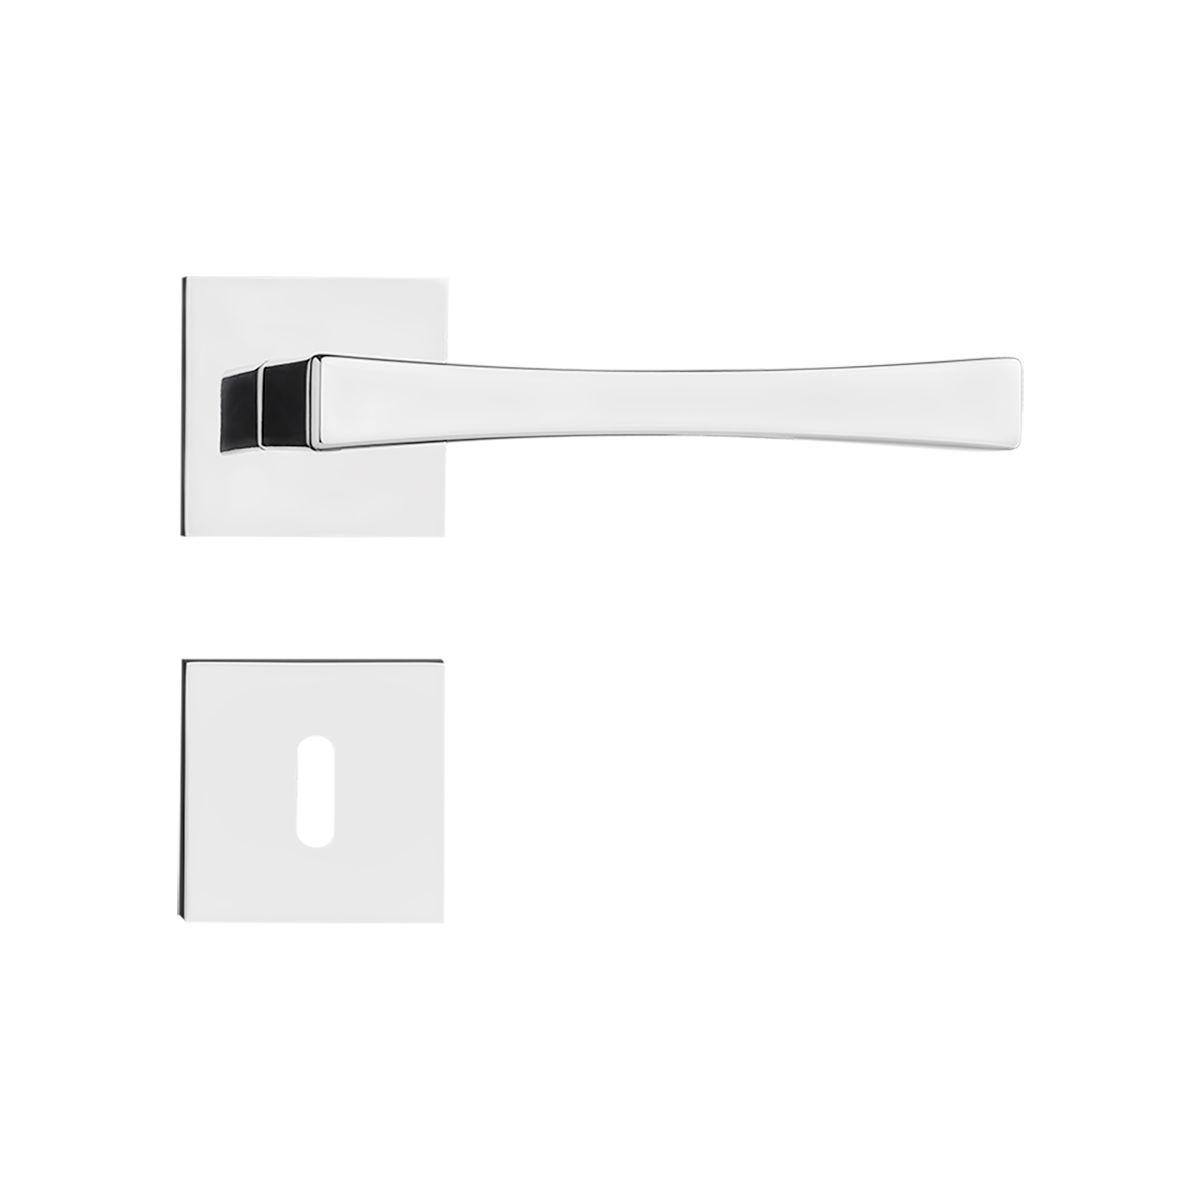 Kit Fechadura Vivaldi CR: 6 Interna; 3 Banheiro